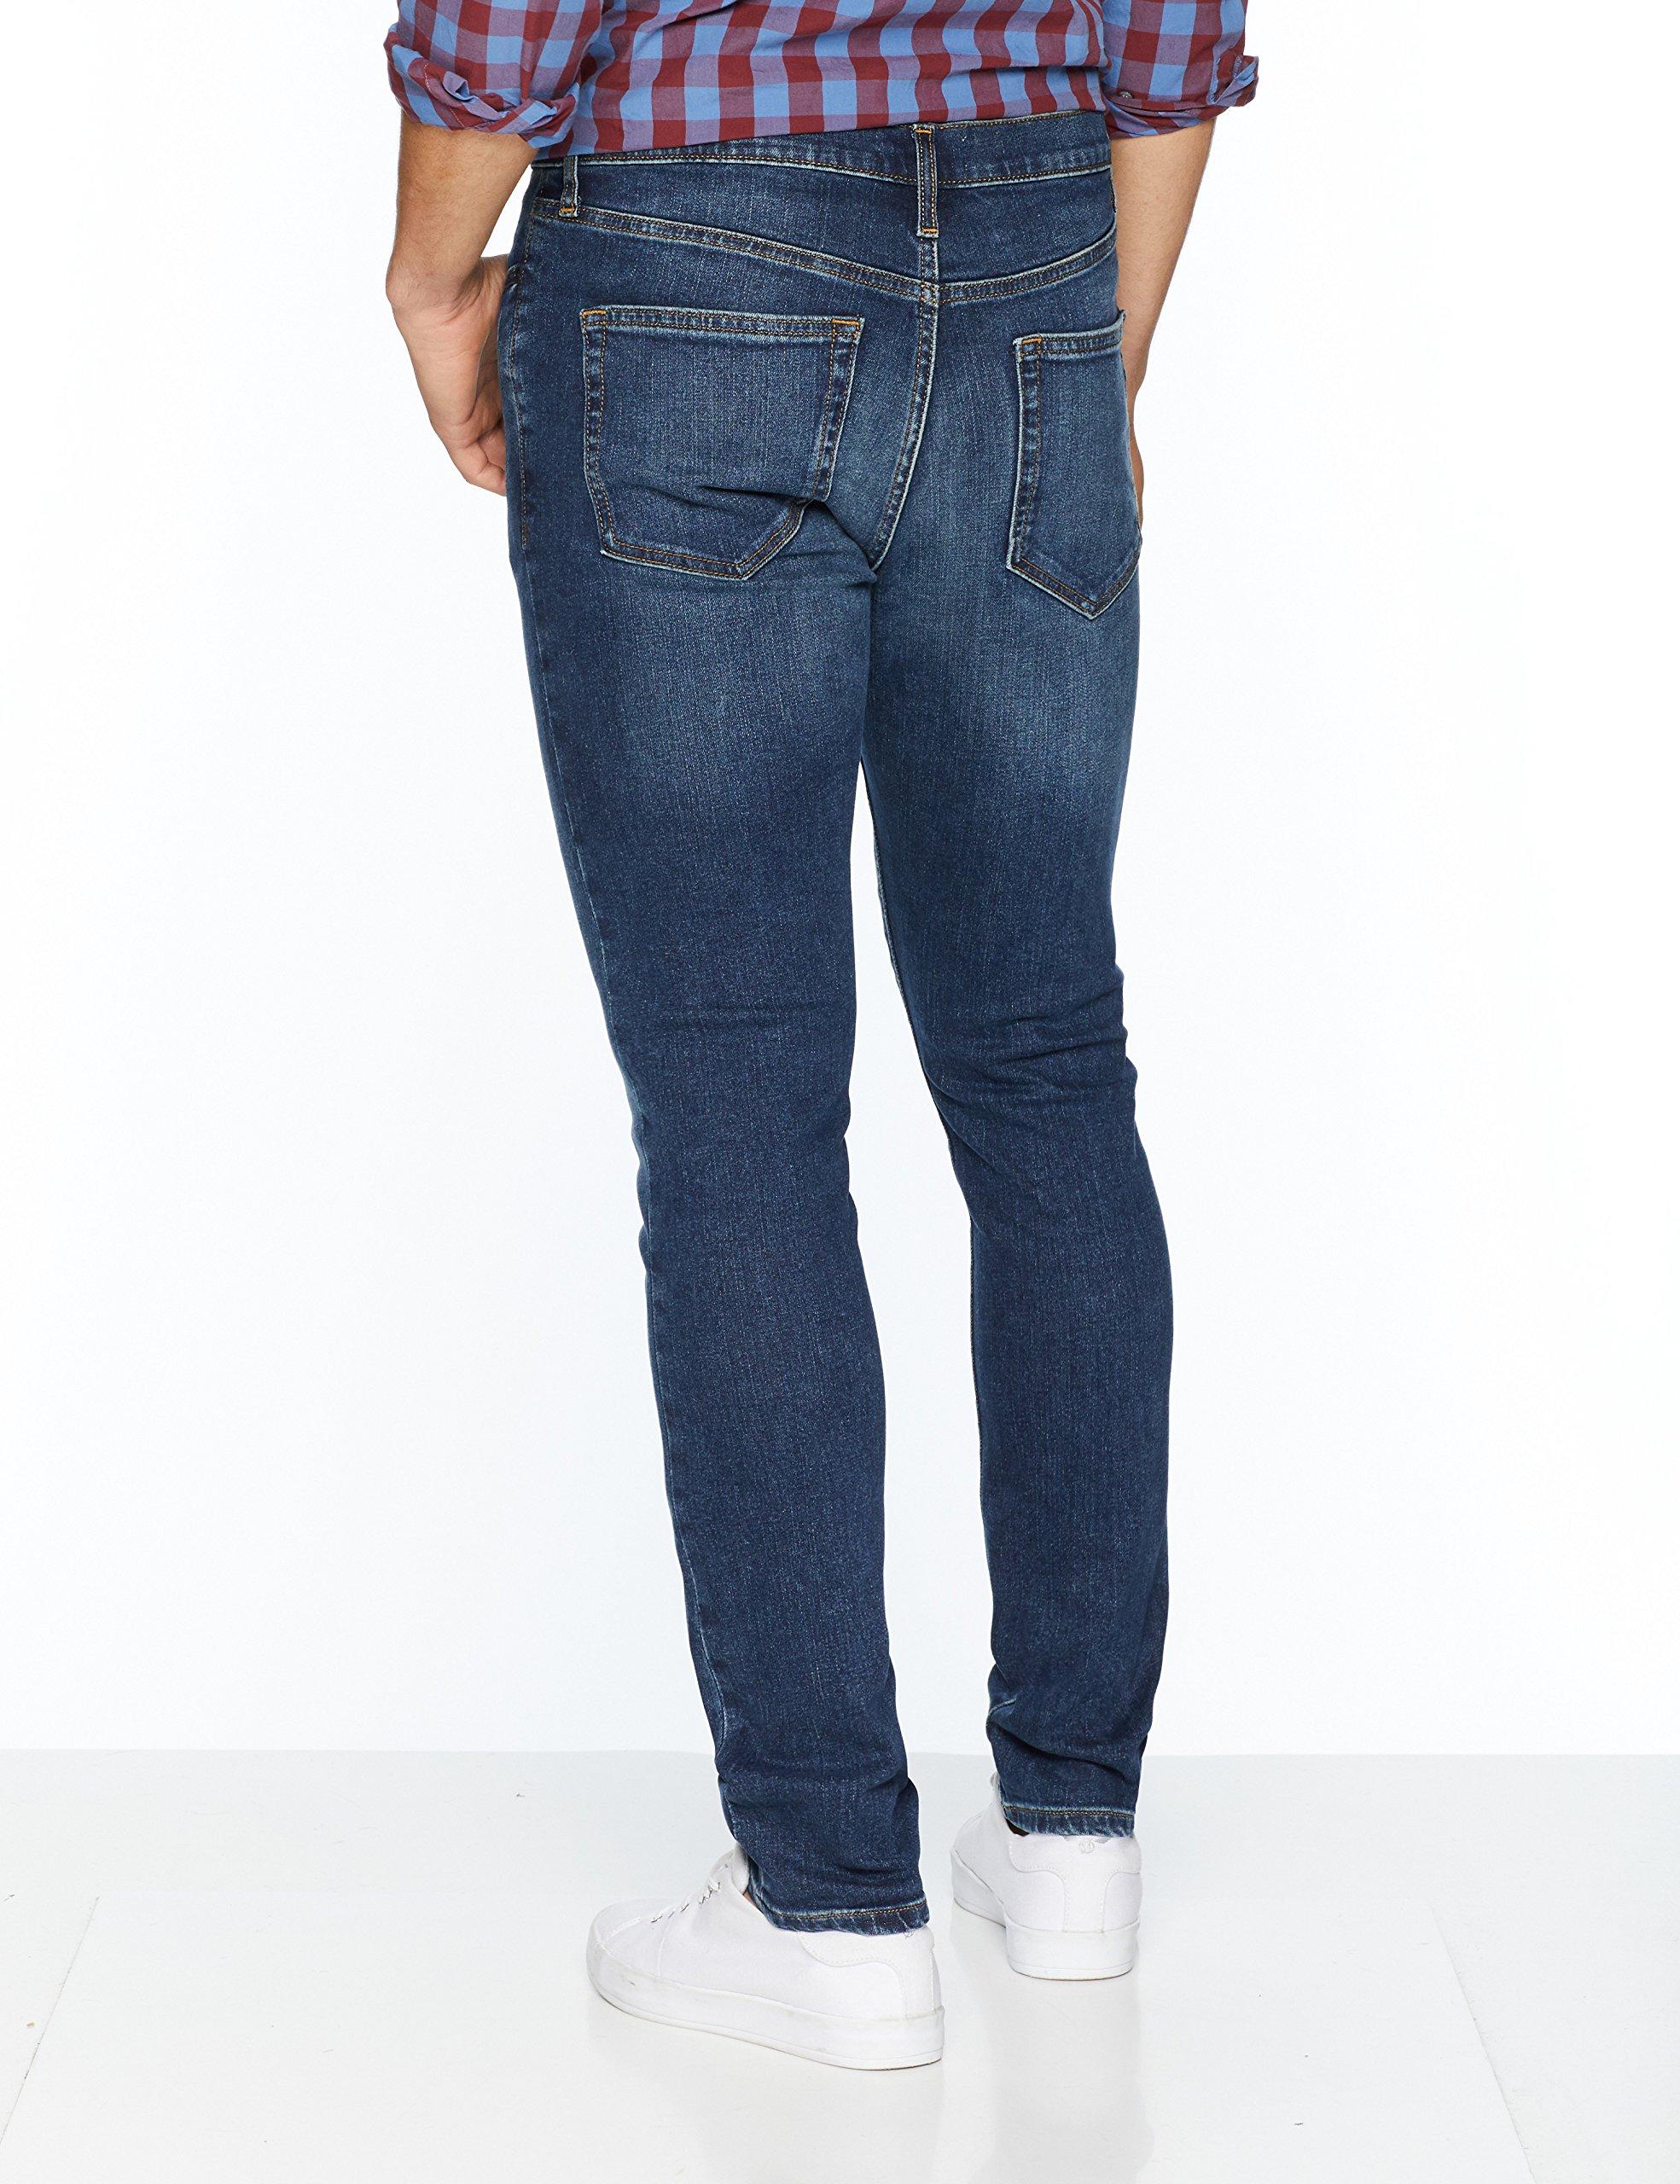 Goodthreads Men's Skinny-Fit Jean, Medium Blue, 38W x 34L by Goodthreads (Image #3)